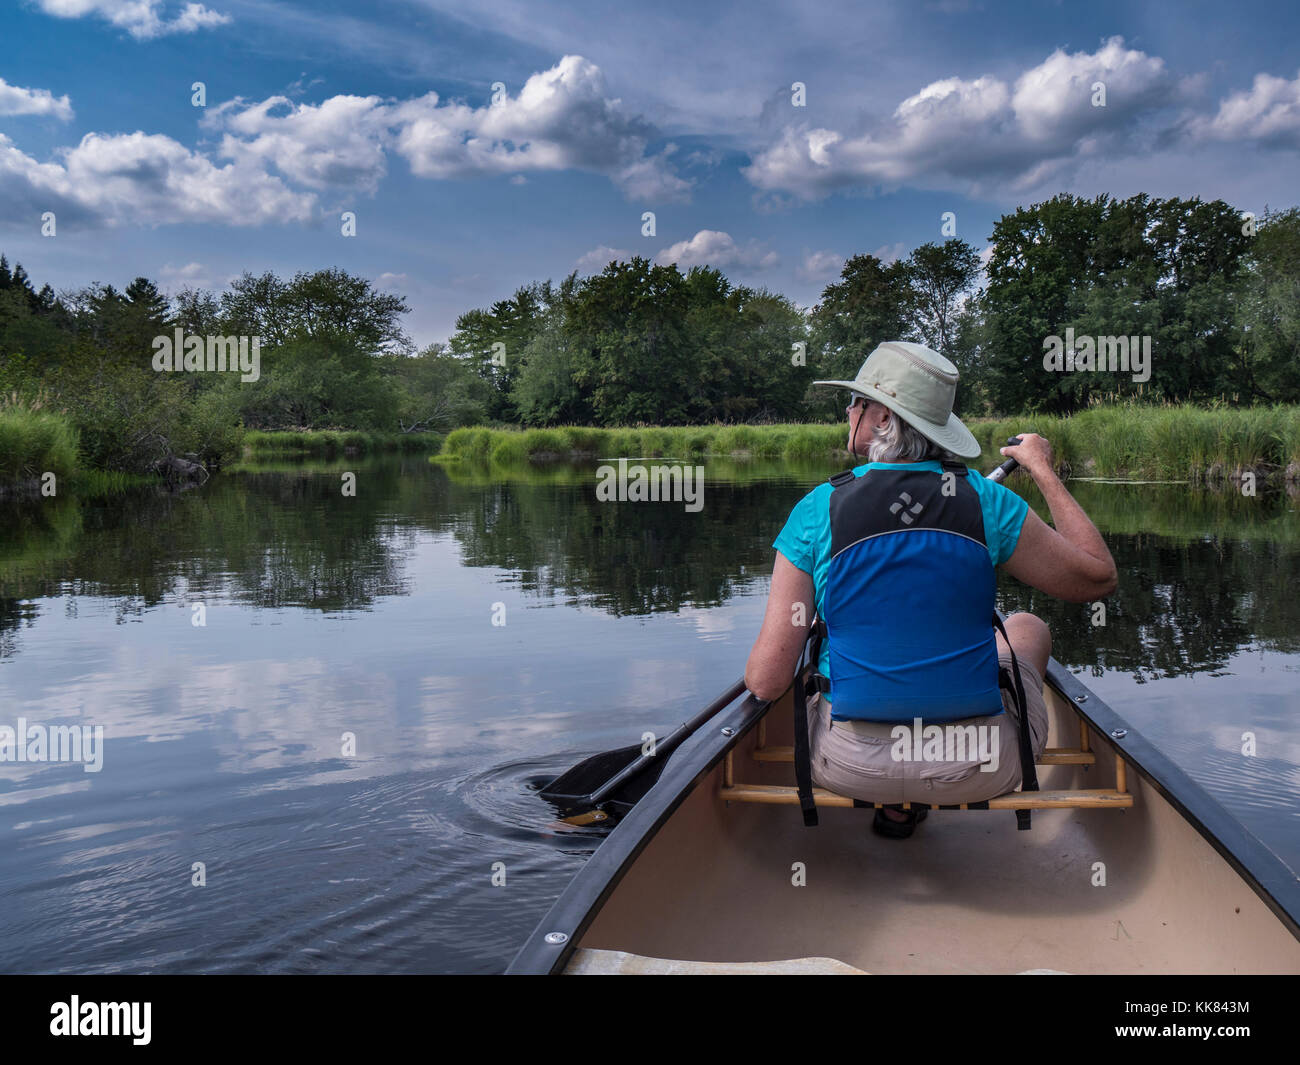 Woman paddles the Mersey River, Kejimkujik National Park, Nova Scotia, Canada. - Stock Image